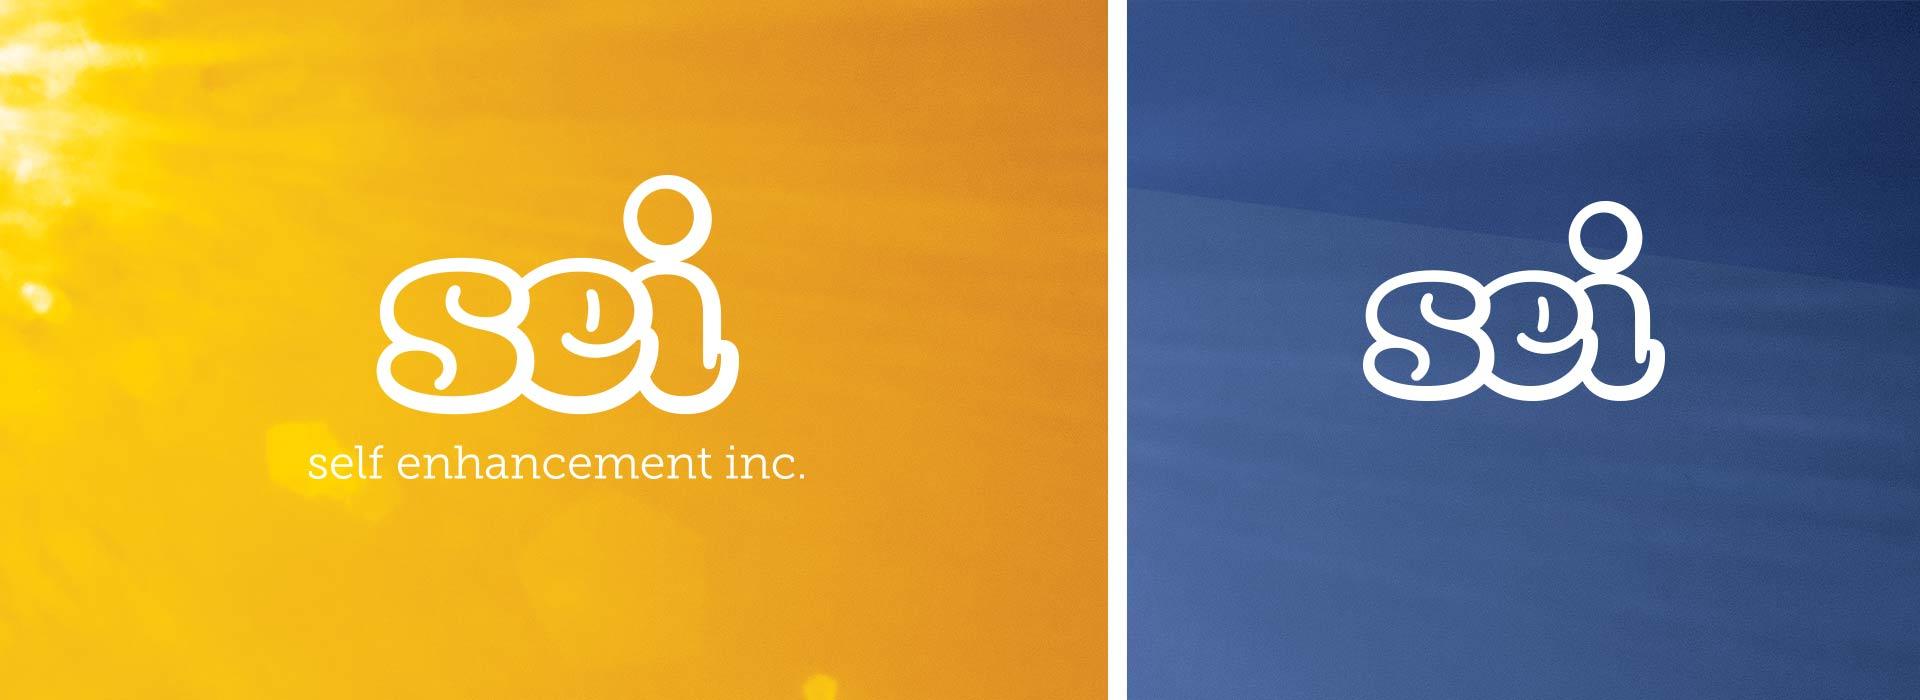 coloful designs logo orange blue